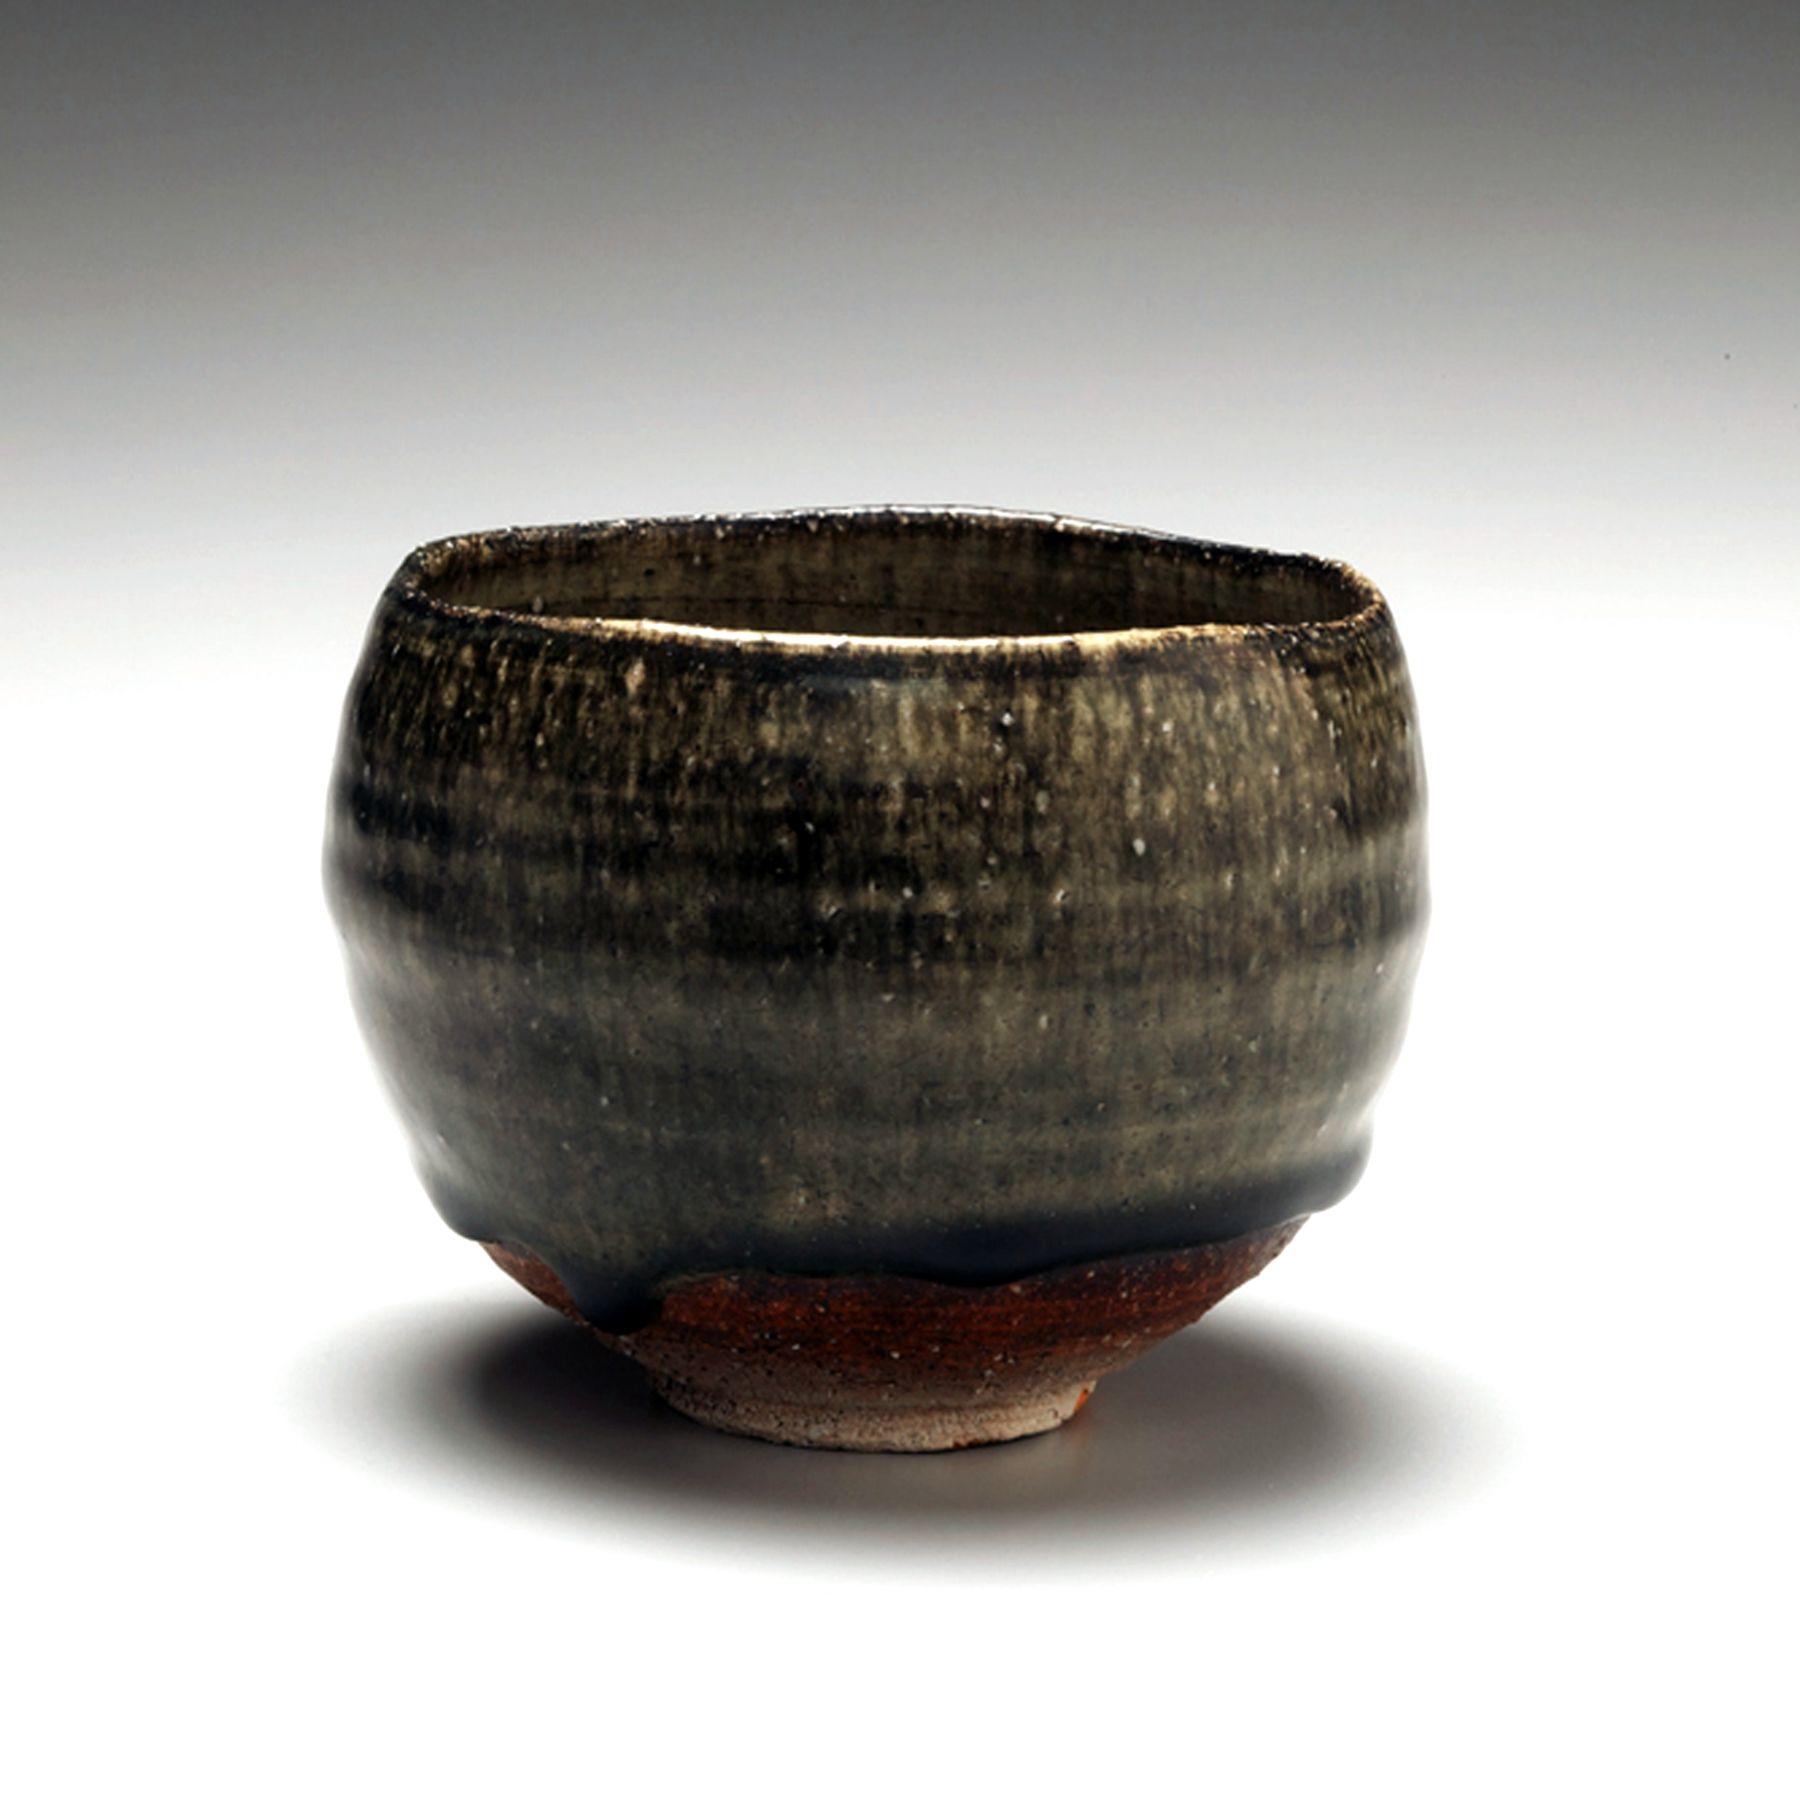 Fujihira Shin (1922-2012), Round teabowl with pooling dark green ash glaze